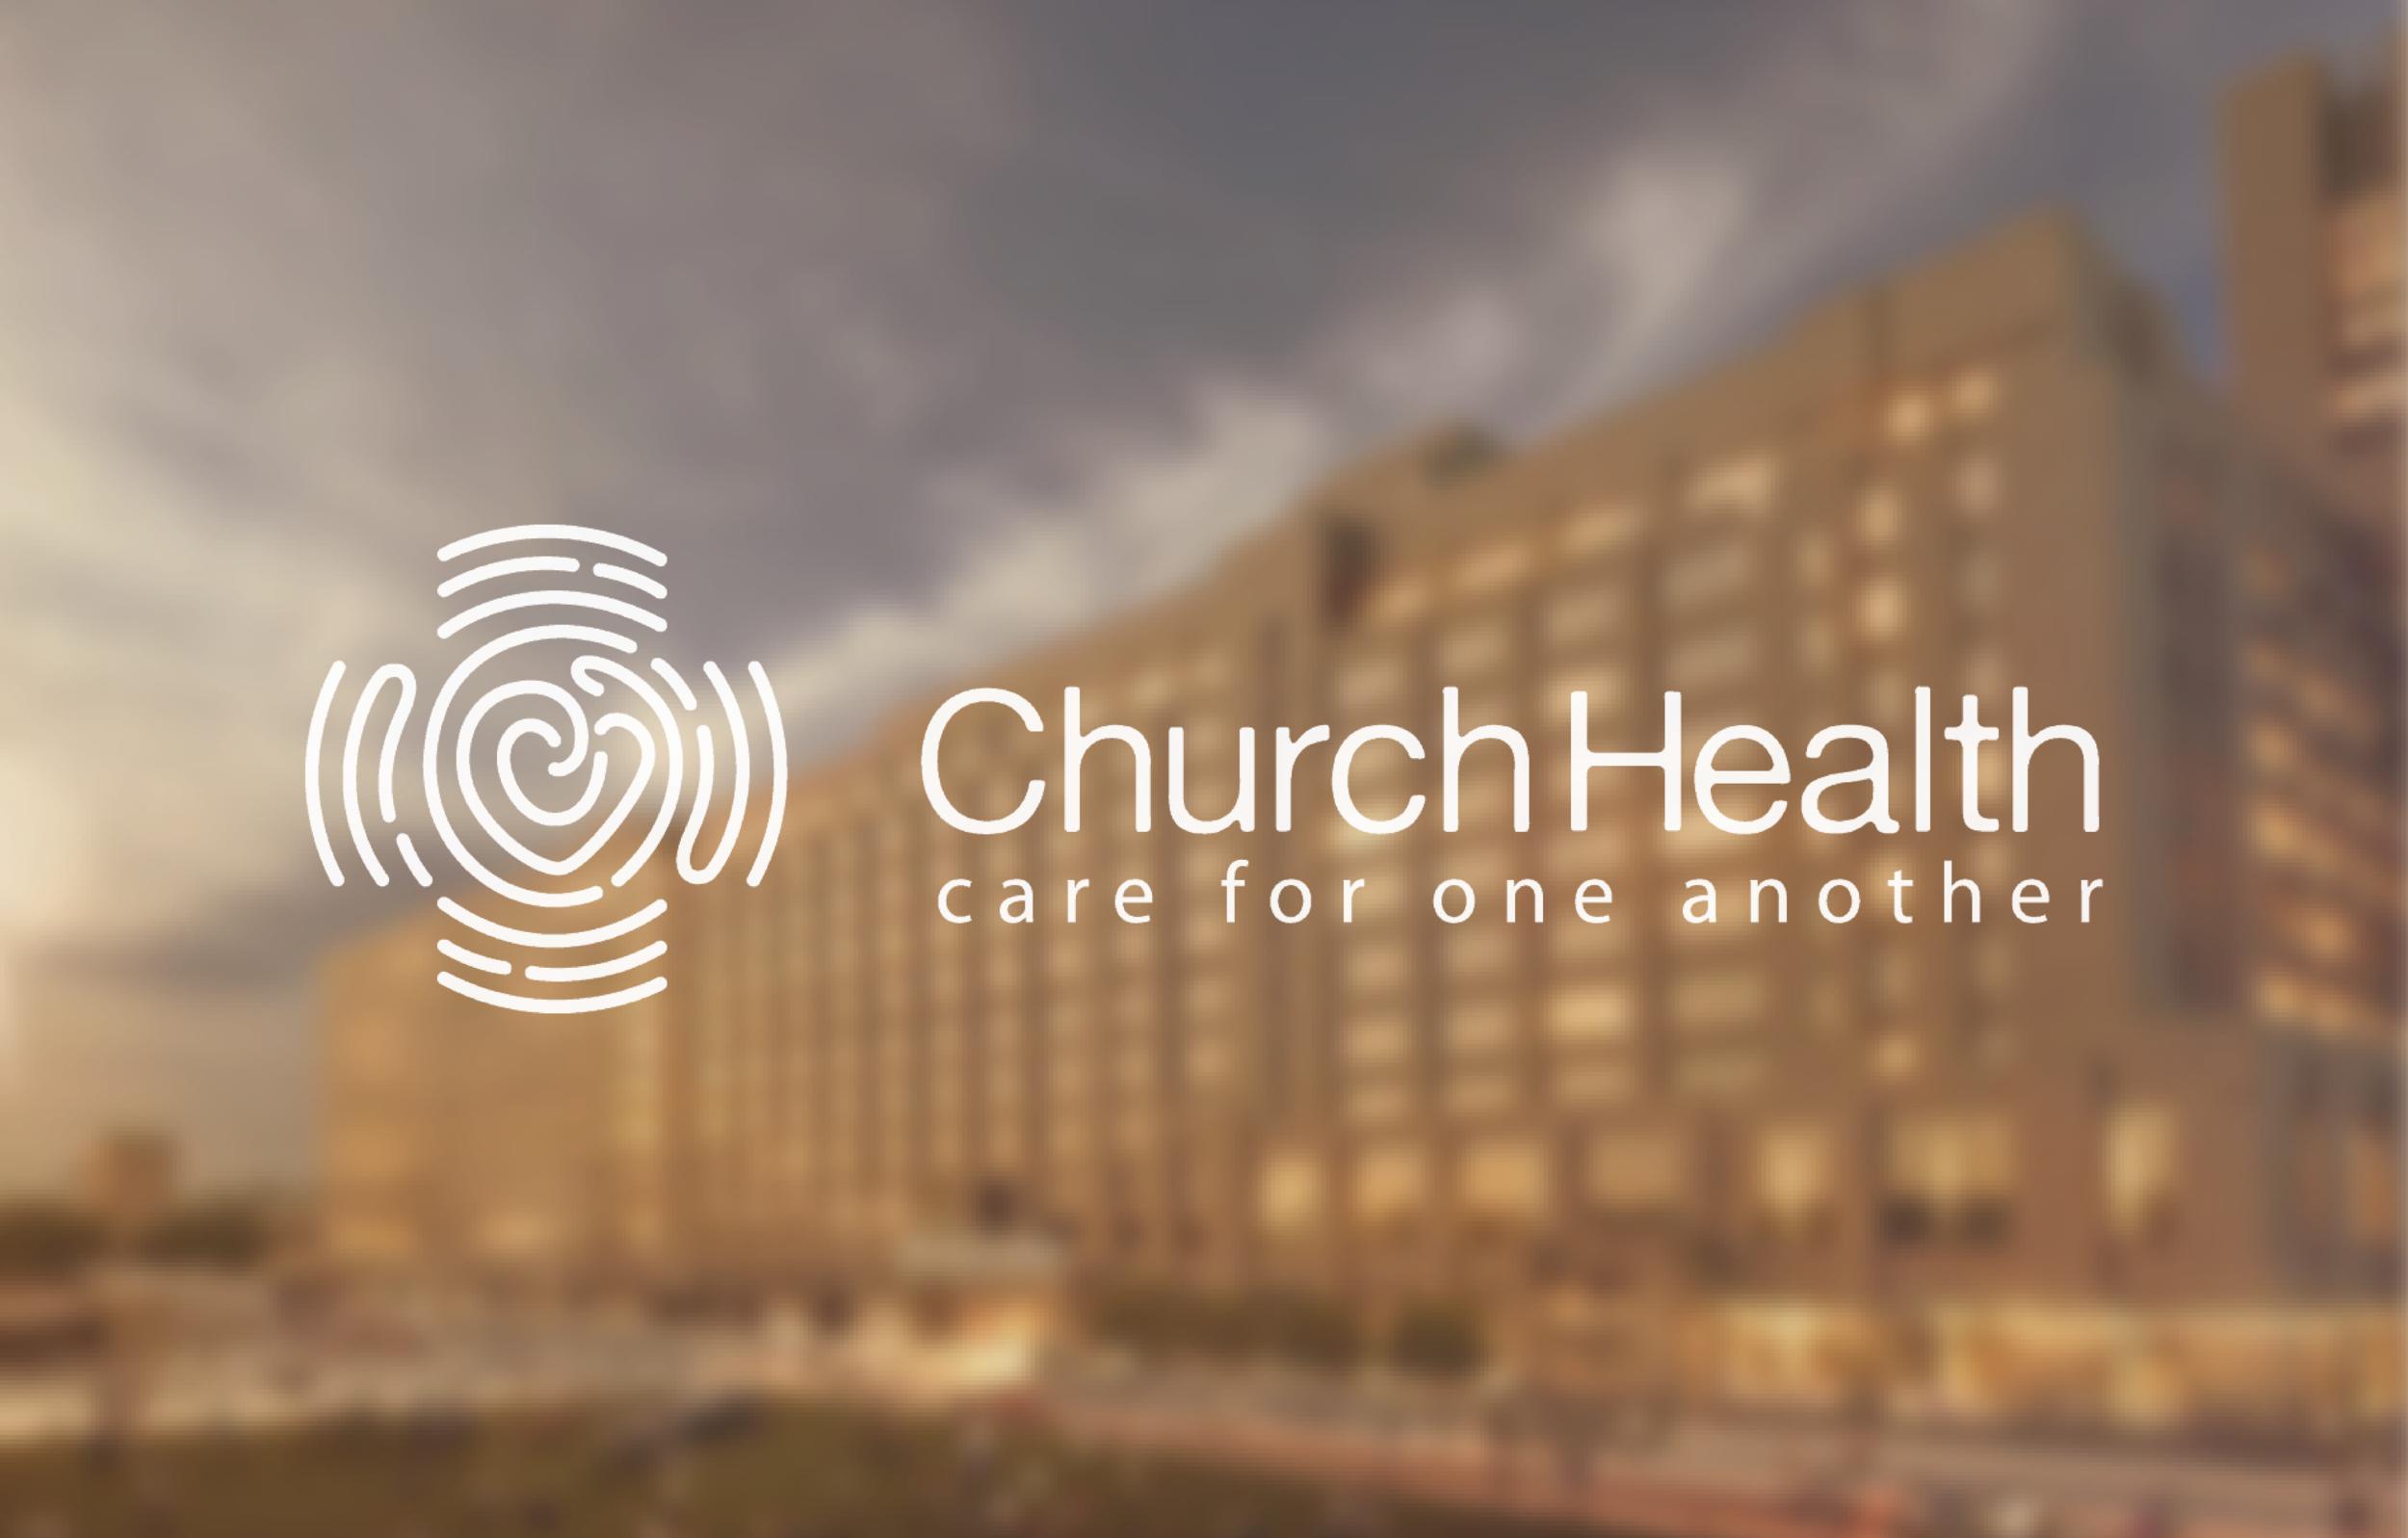 Church Health Case Study Thumbnail-01-01-01.png